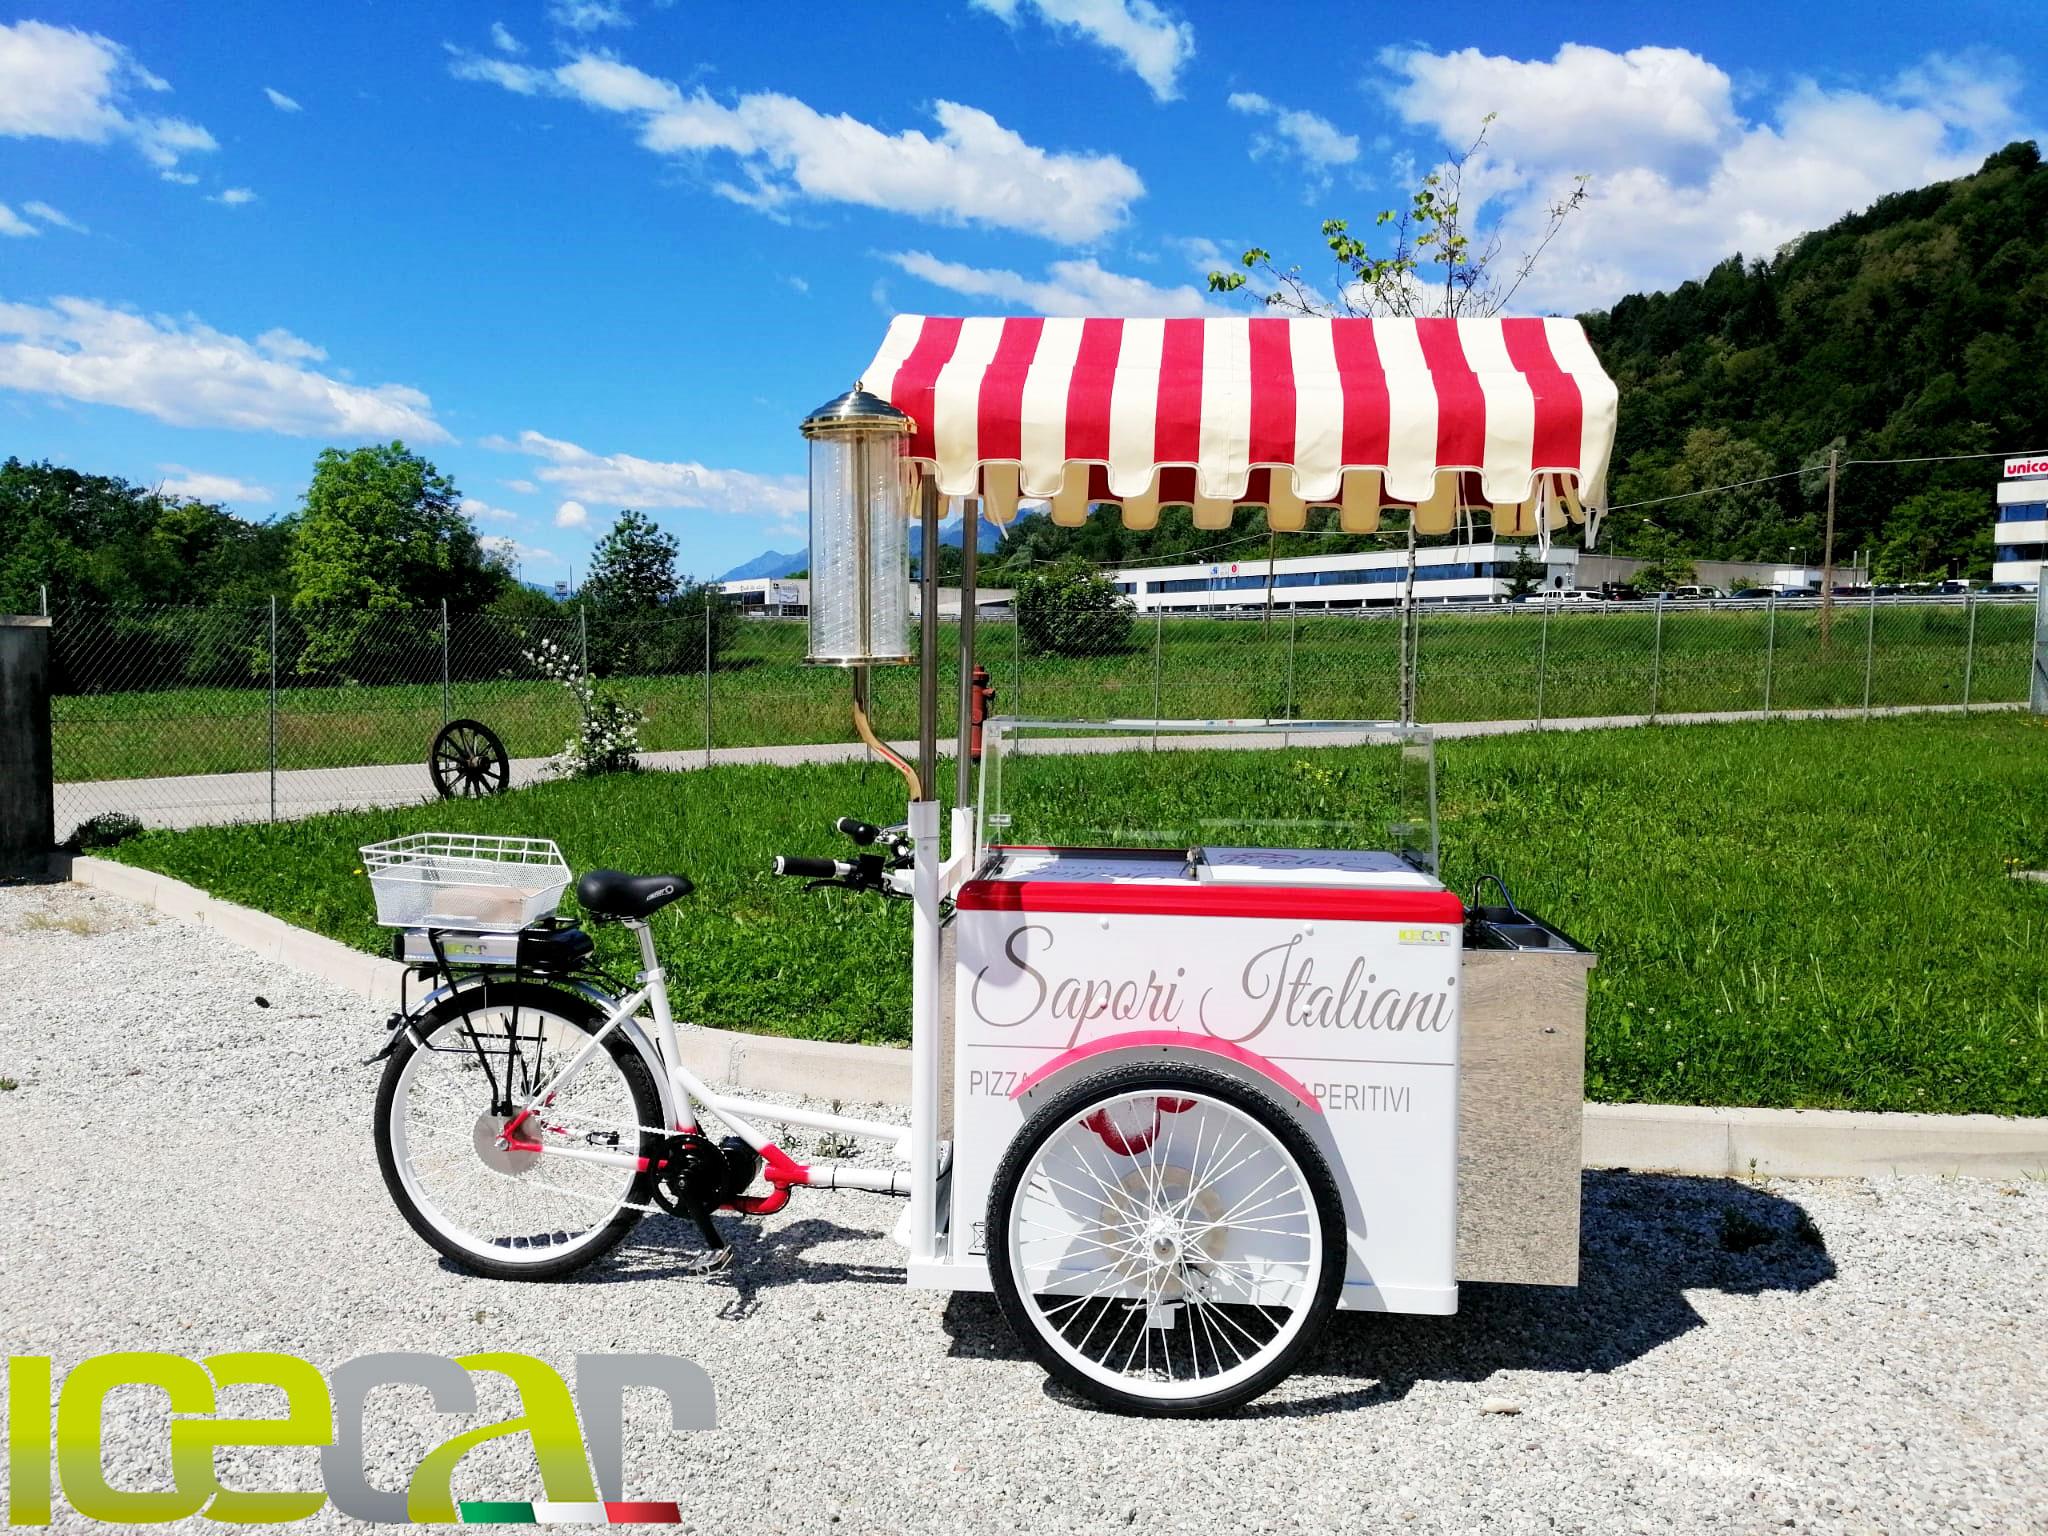 Bici Gelato E-Bike